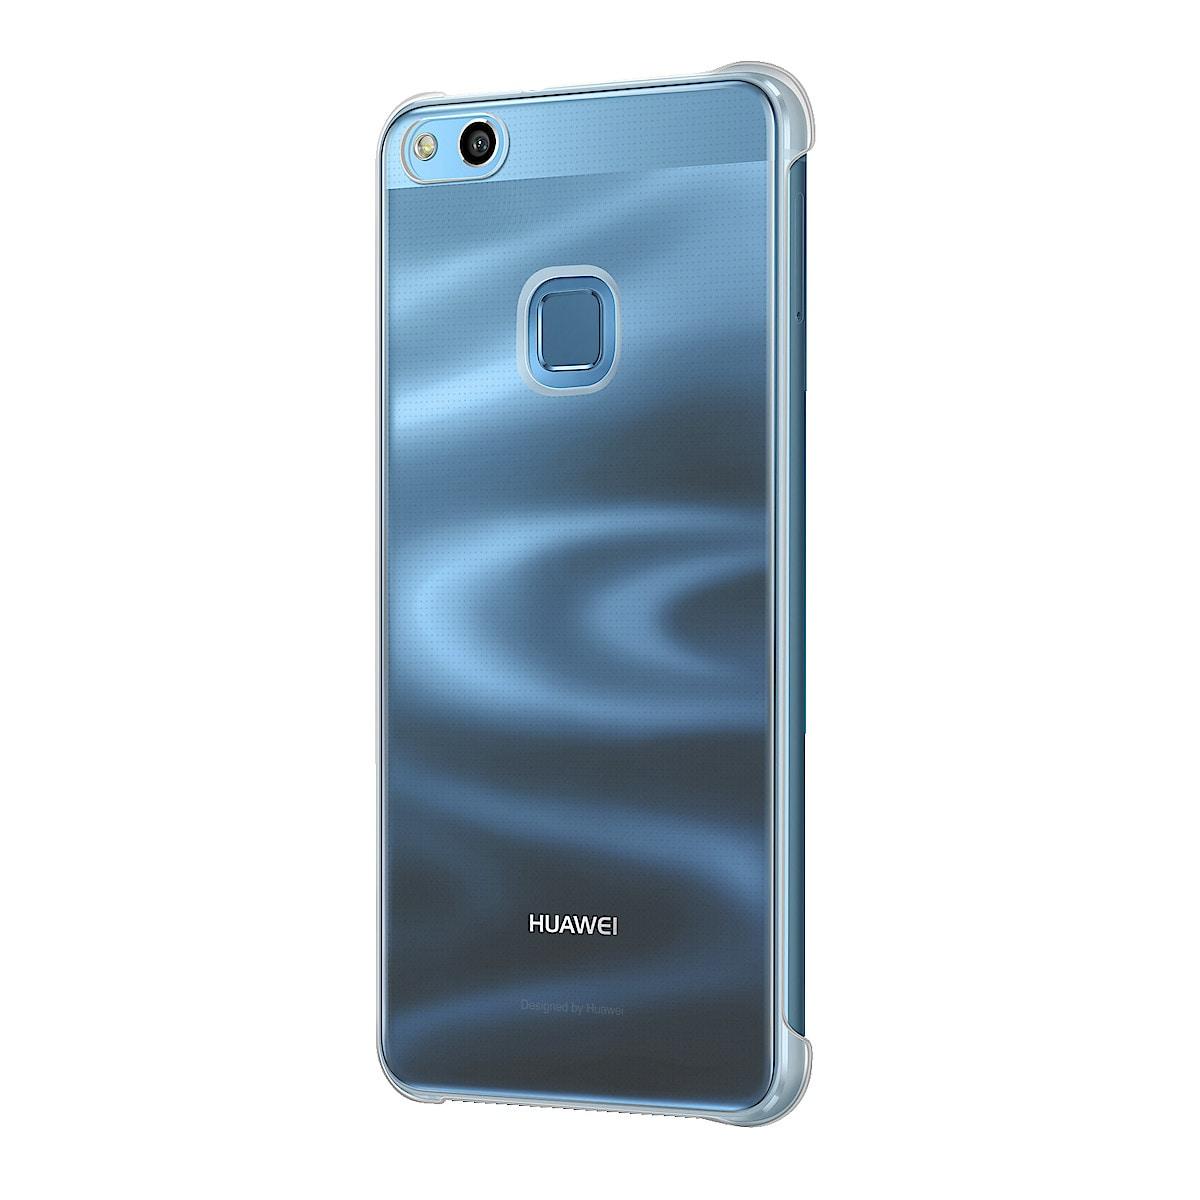 Mobildeksel til Huawei P10 Lite